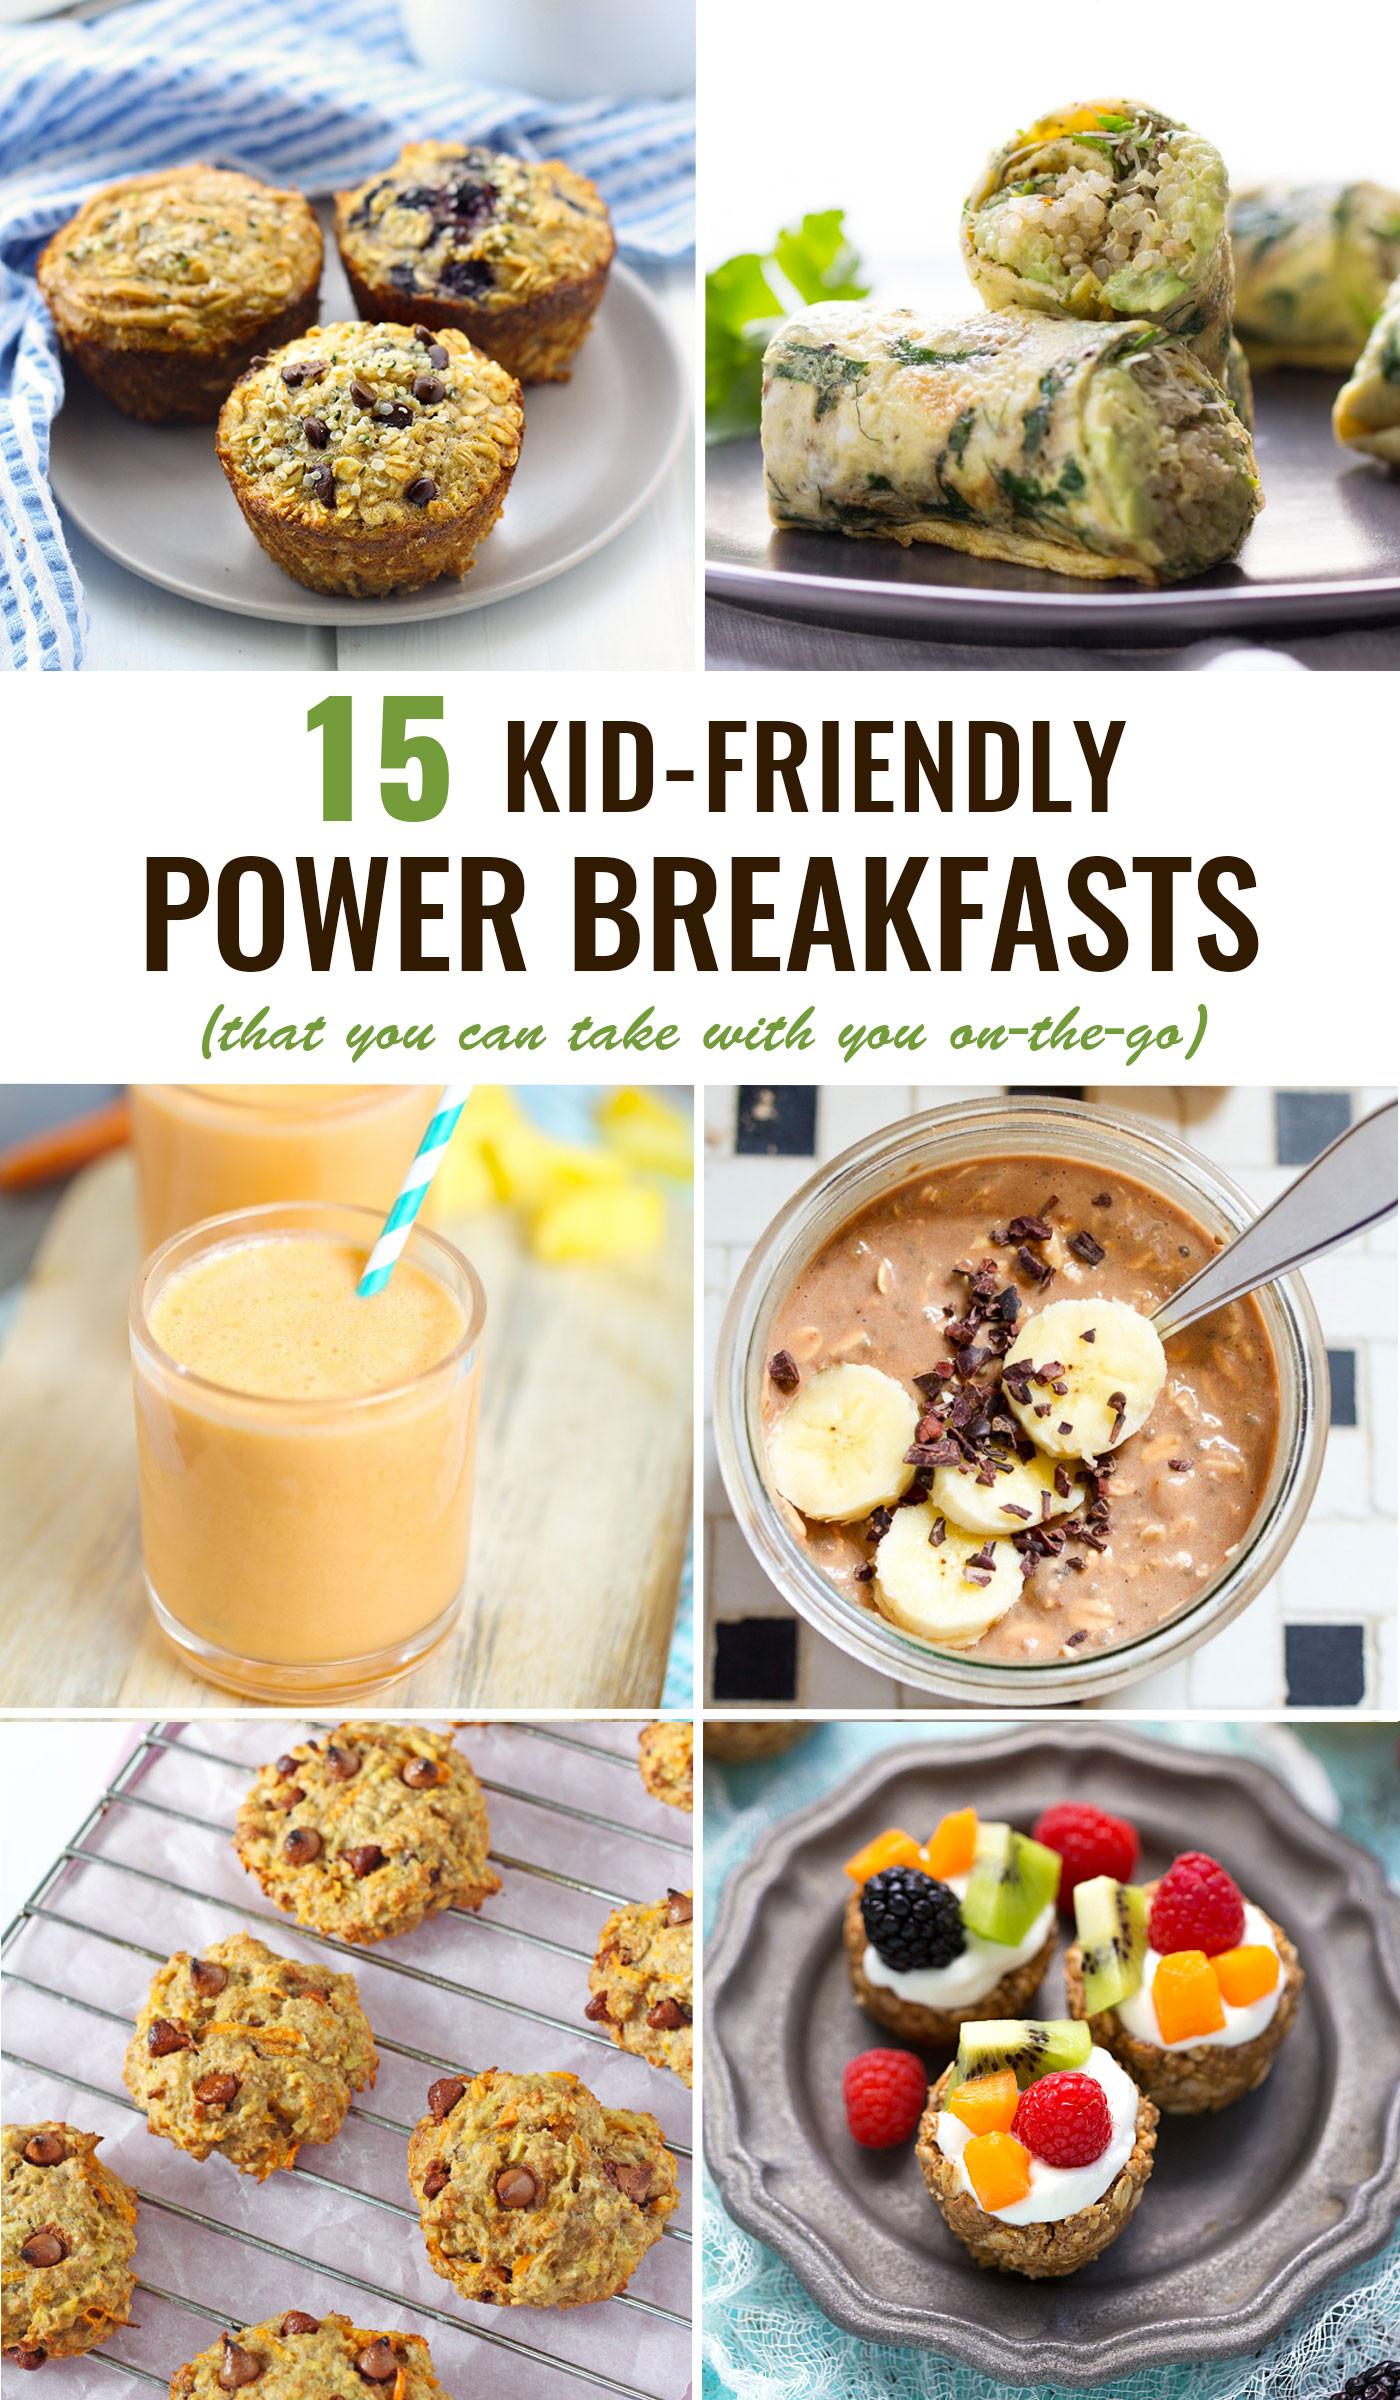 Healthy Breakfast Recipes For Kids  Kid Friendly Power Breakfasts To Go